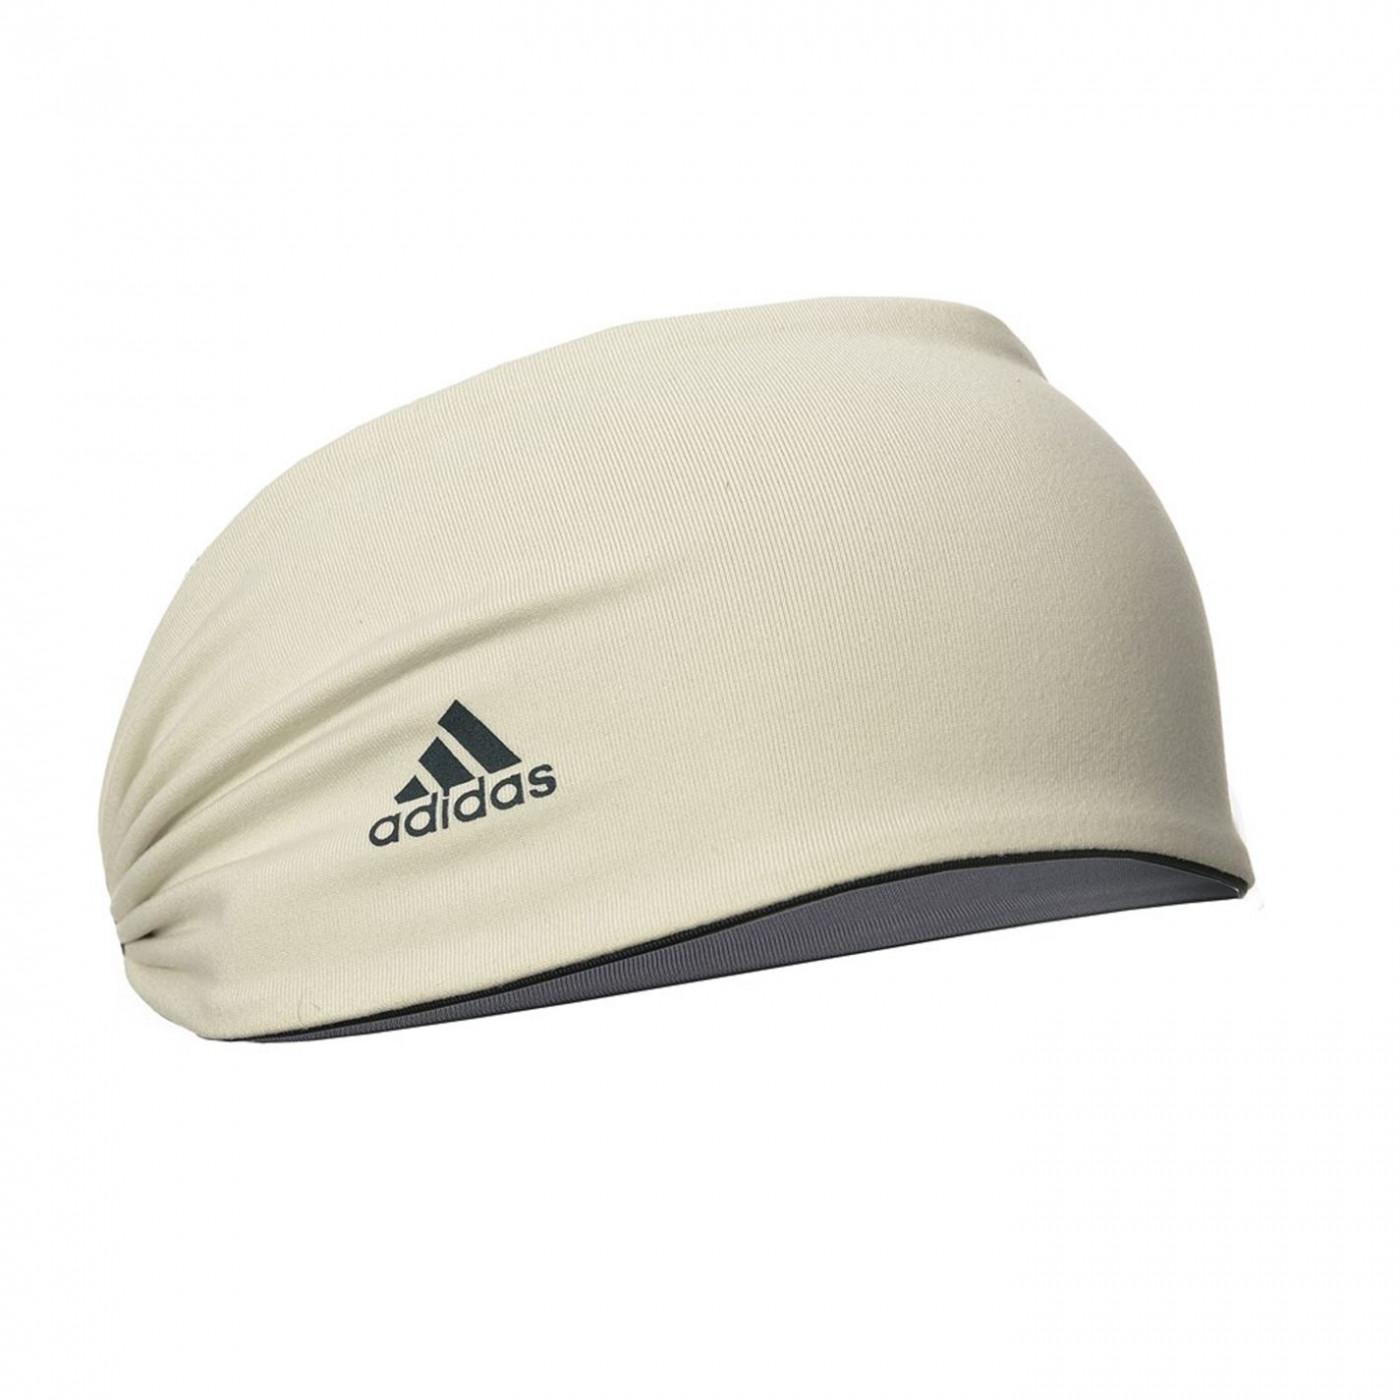 Adidas Head Band